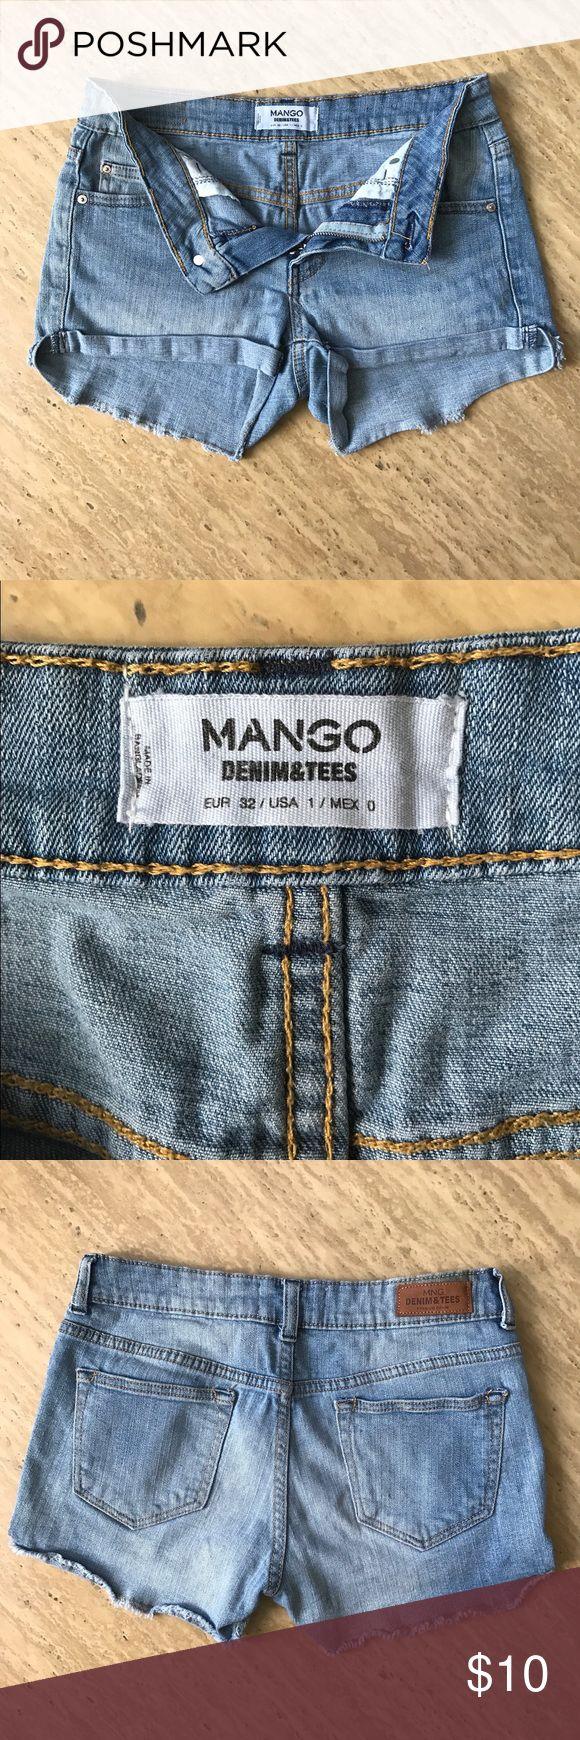 Mango Denim Shorts Mango Denim Shorts Size 1 Mango Shorts Jean Shorts